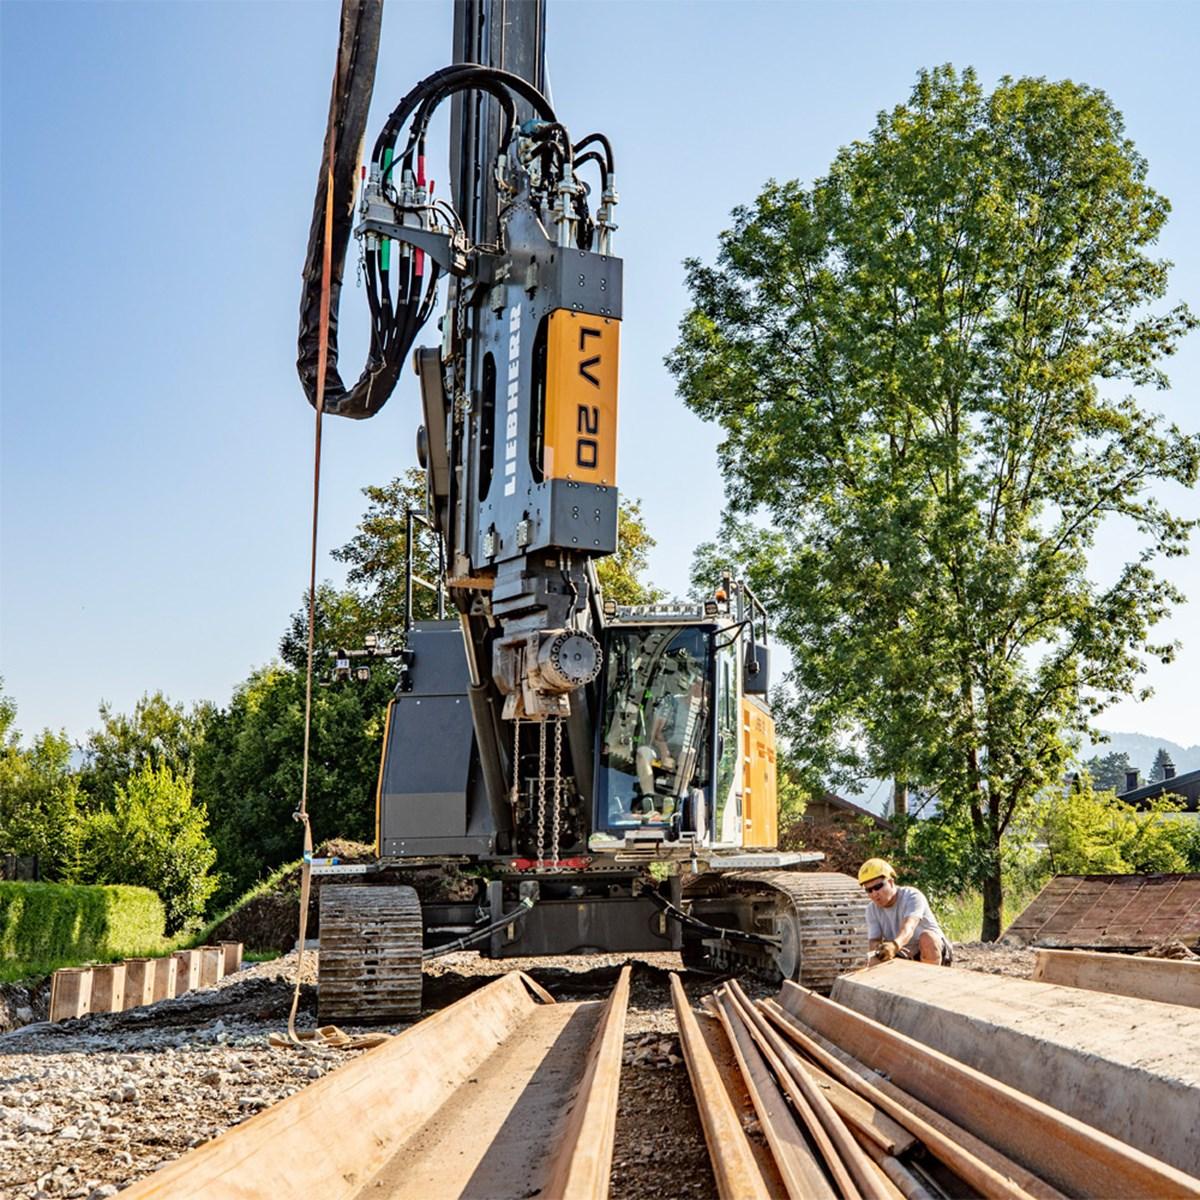 liebherr-piling-and-drilling-lrb-18-vibrator-lv-20-shhet-piles-spundwaende-2-1.jpg